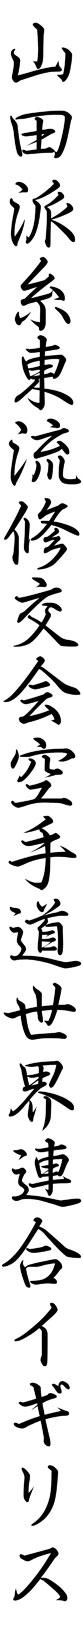 02---yssku_kanji_blk_thin_vert